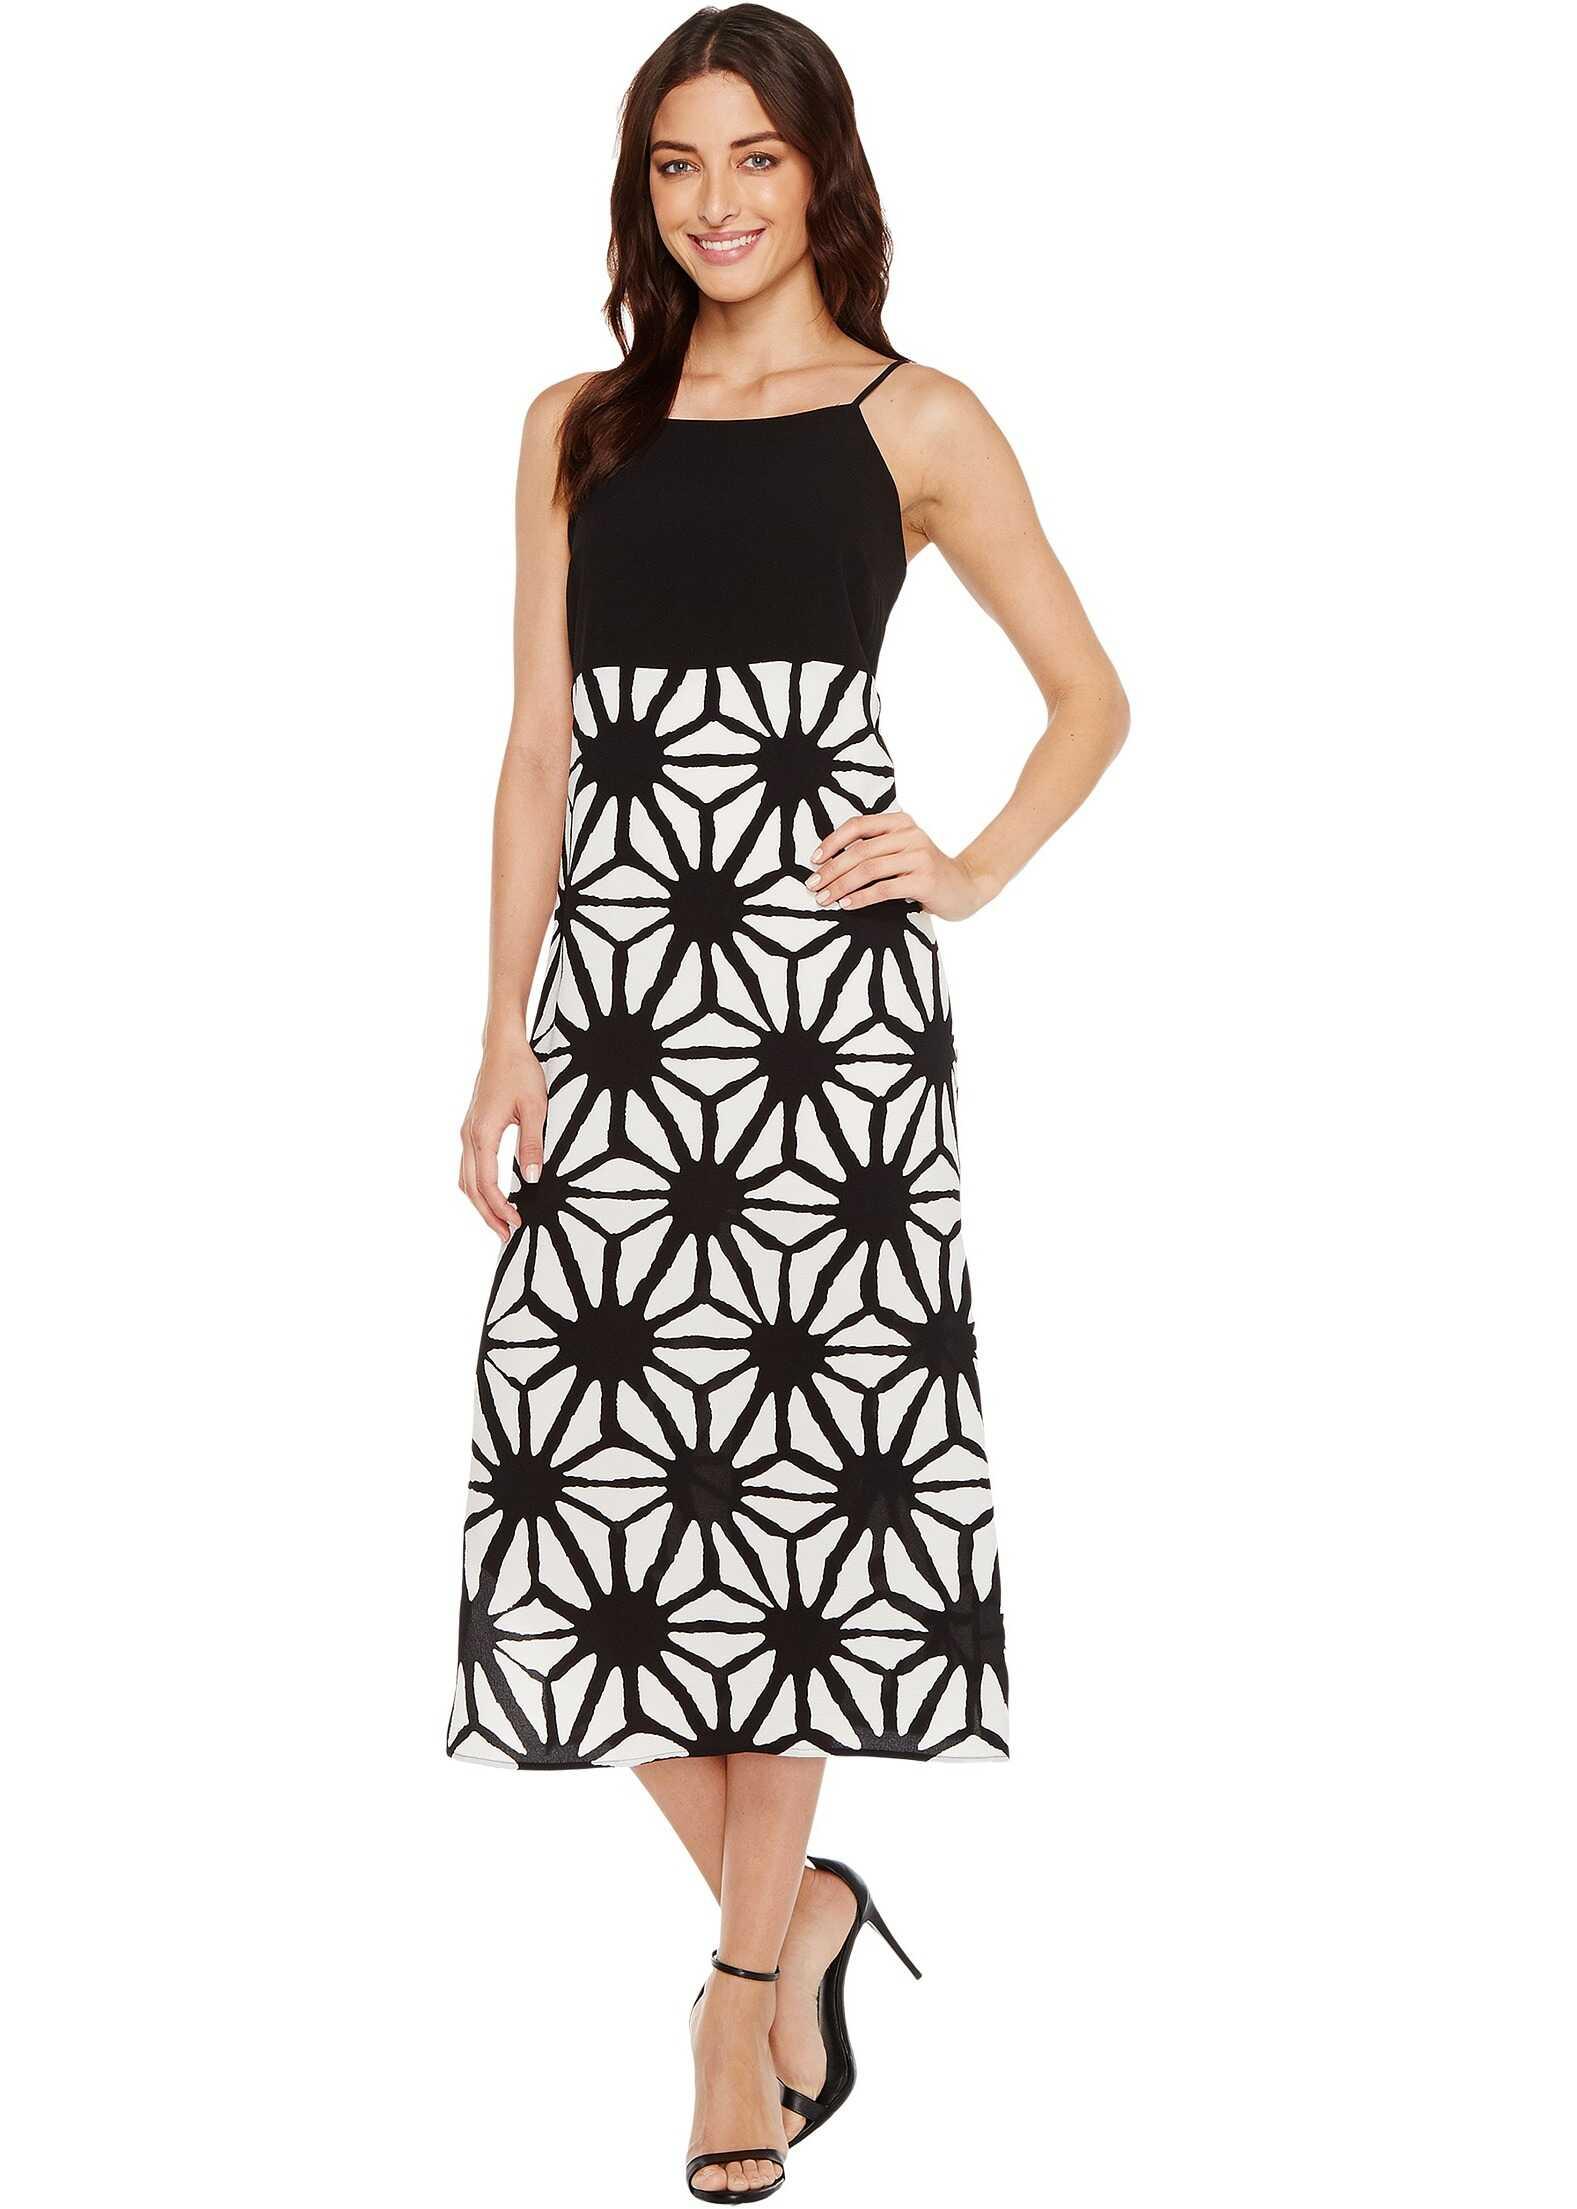 Vince Camuto Tribal Starlight Maxi Dress w/ Side Slits Rich Black